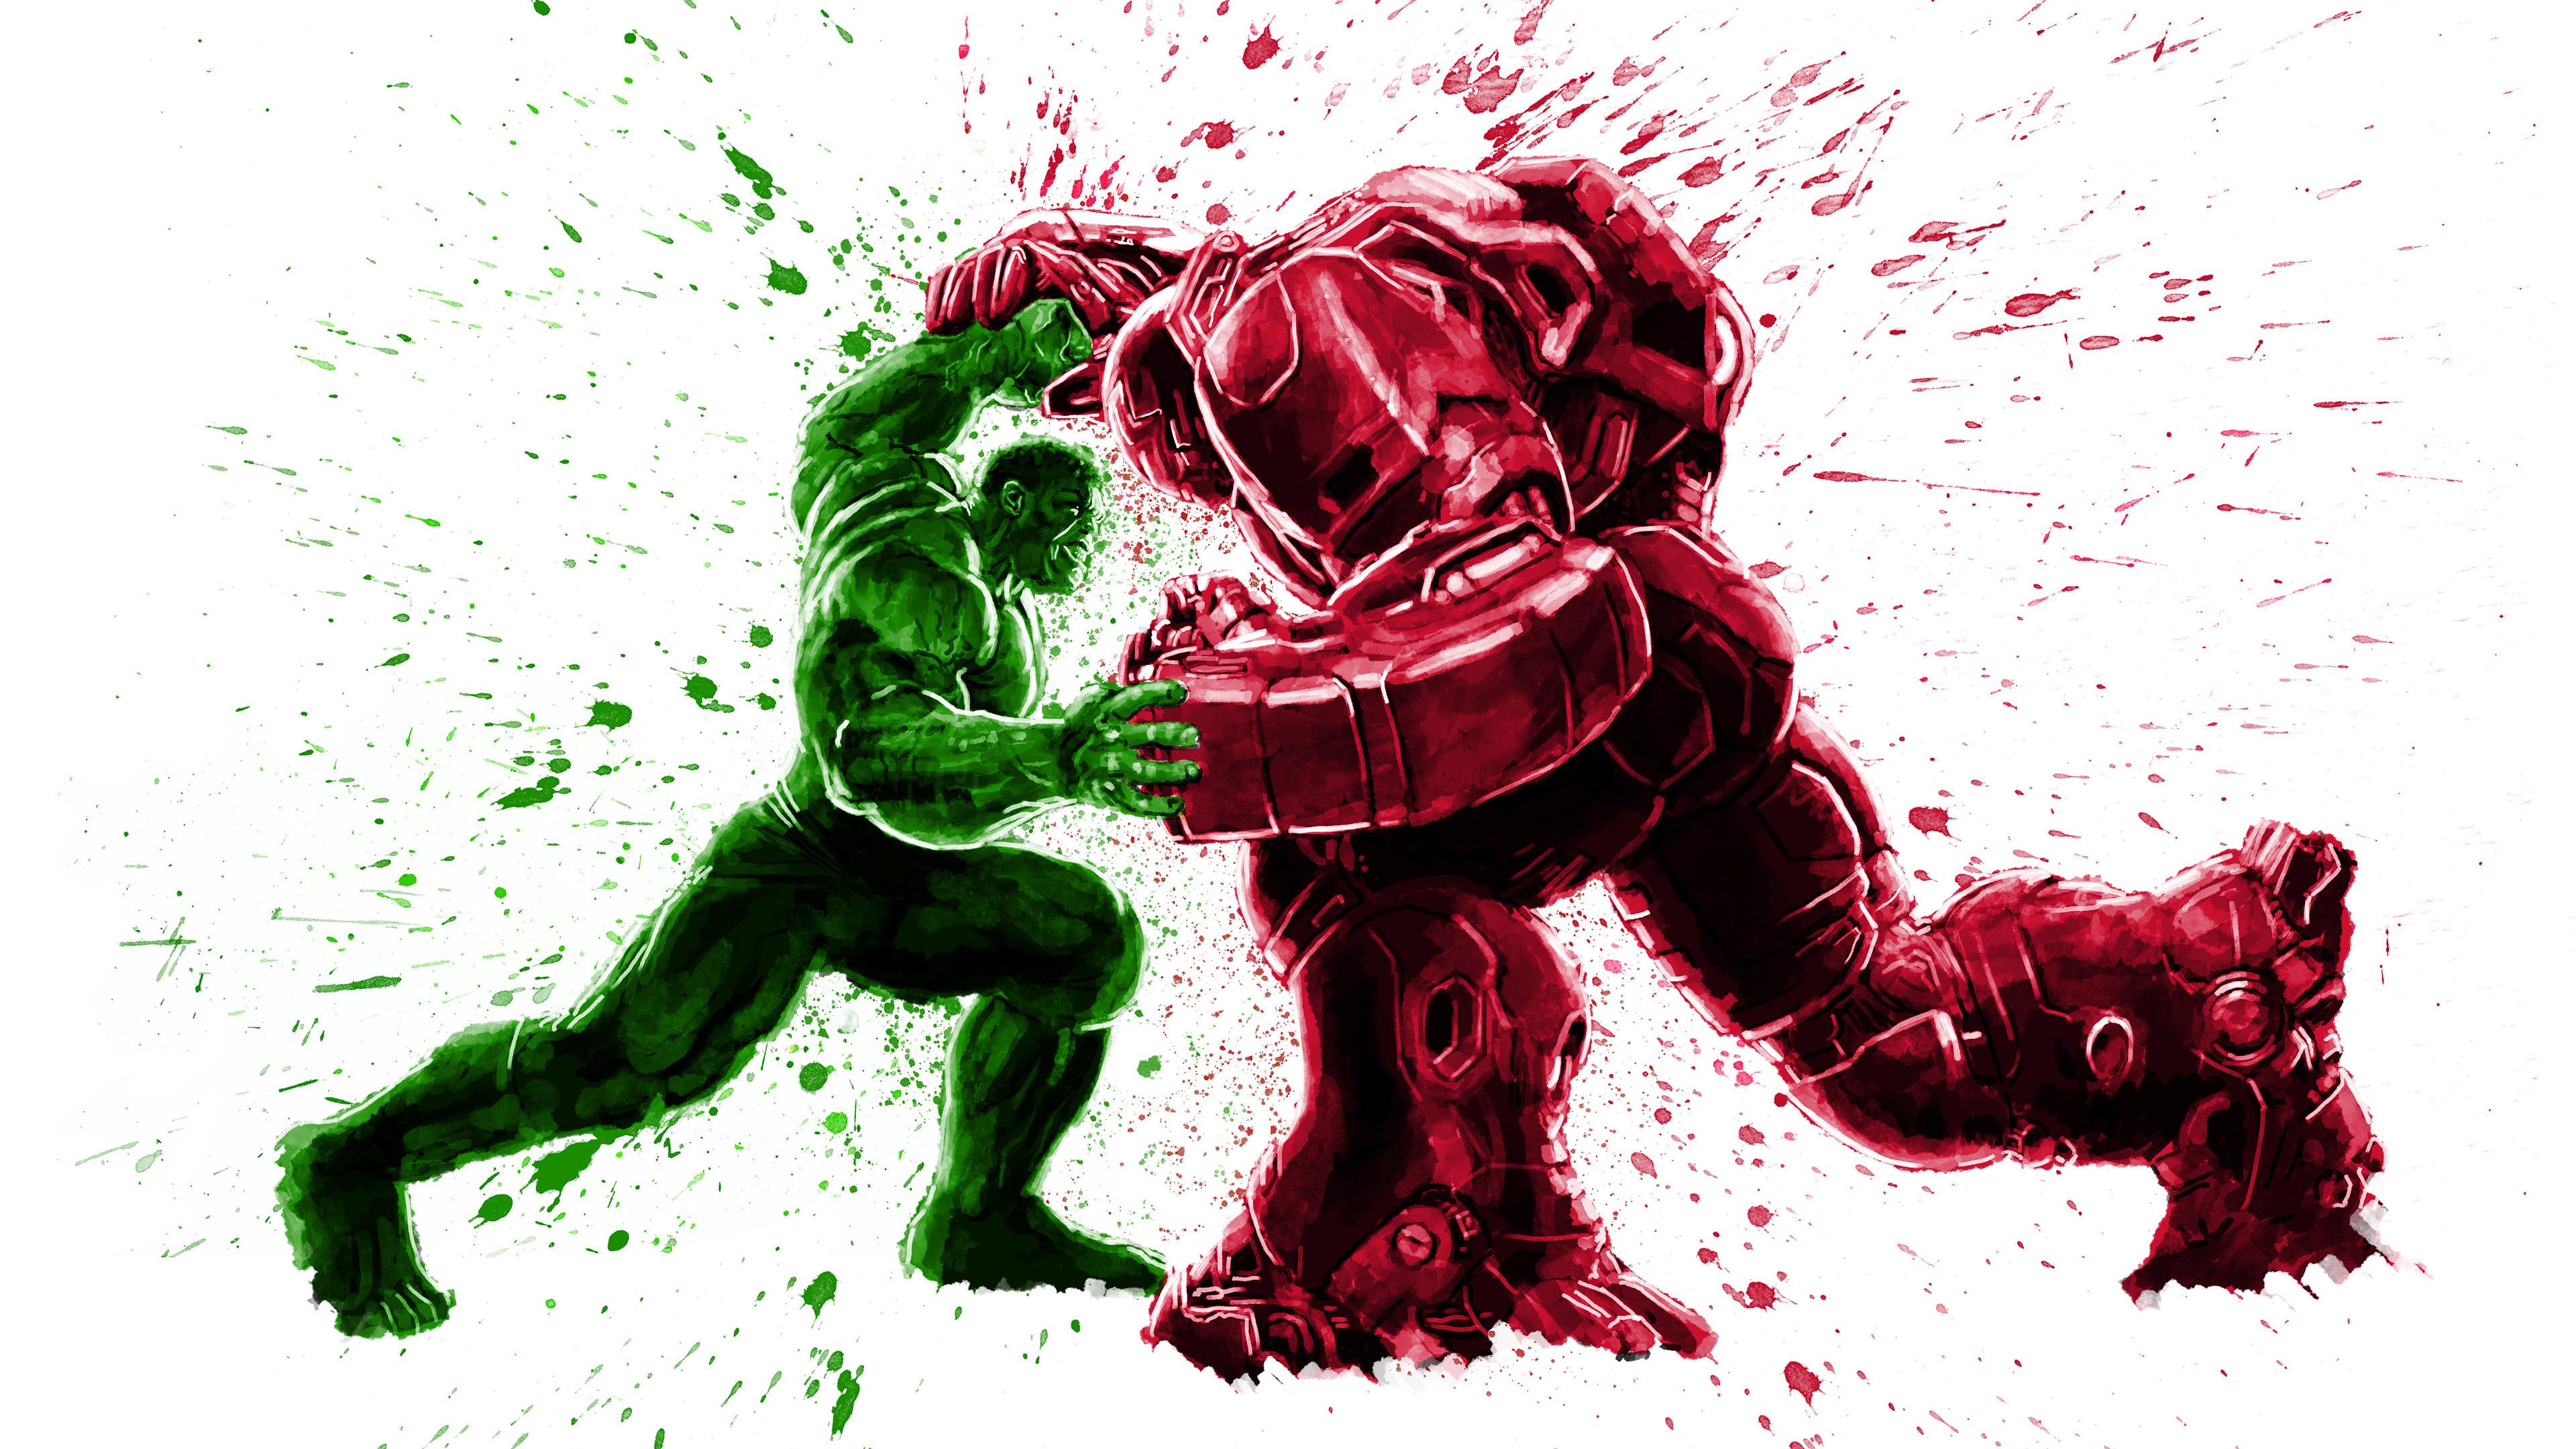 hulk and iron hulkbuster 4k 1544286763 - Hulk And Iron Hulkbuster 4k - superheroes wallpapers, hulkbuster wallpapers, hulk wallpapers, hd-wallpapers, digital art wallpapers, behance wallpapers, artwork wallpapers, 4k-wallpapers